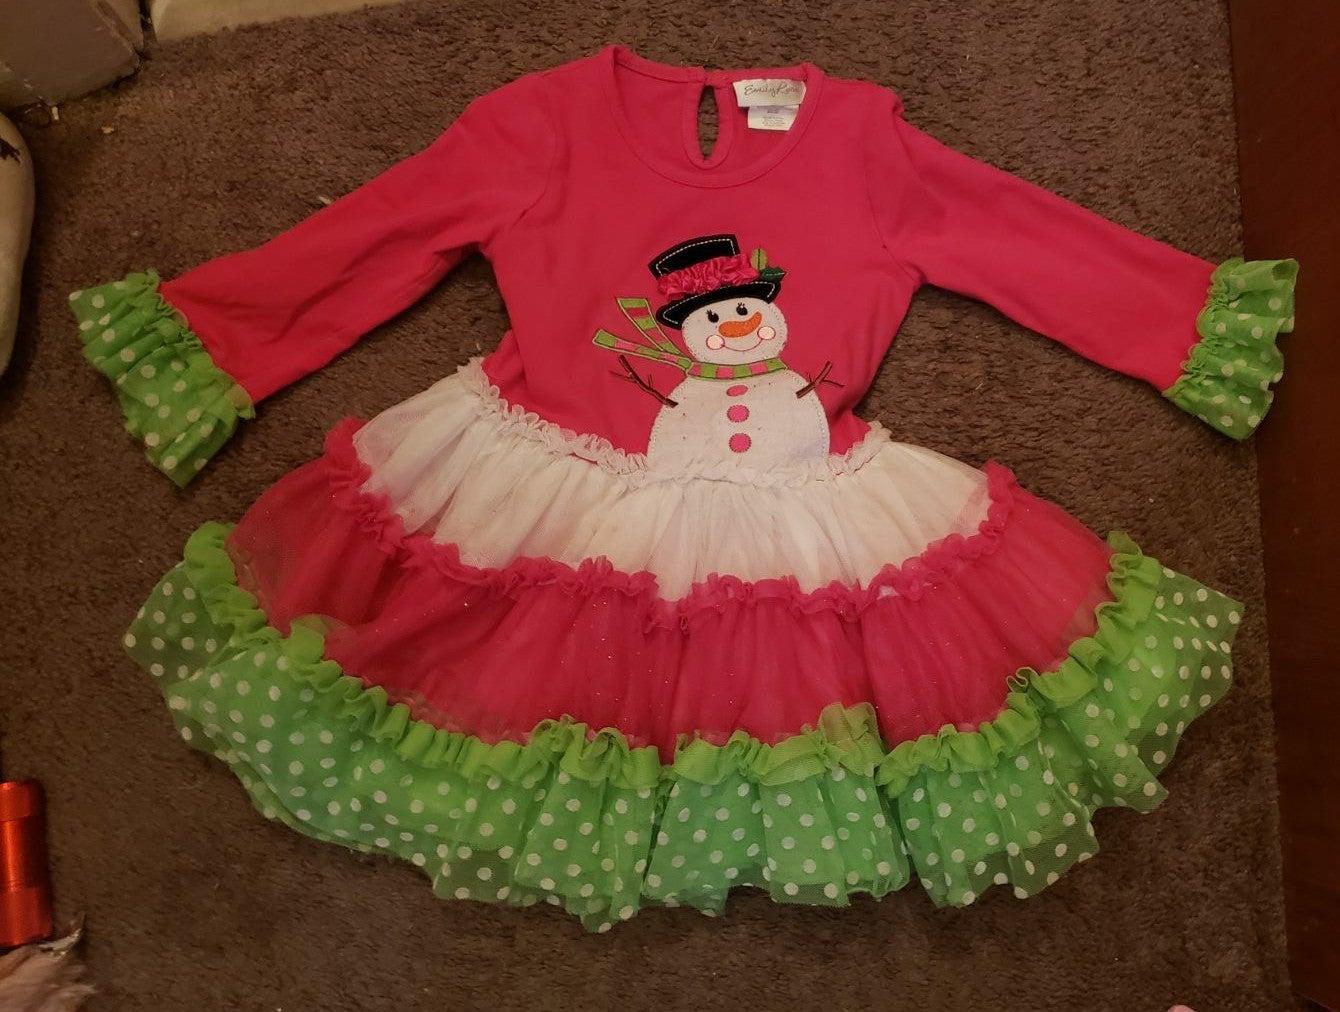 Cute snowman dress Emily rose 3t